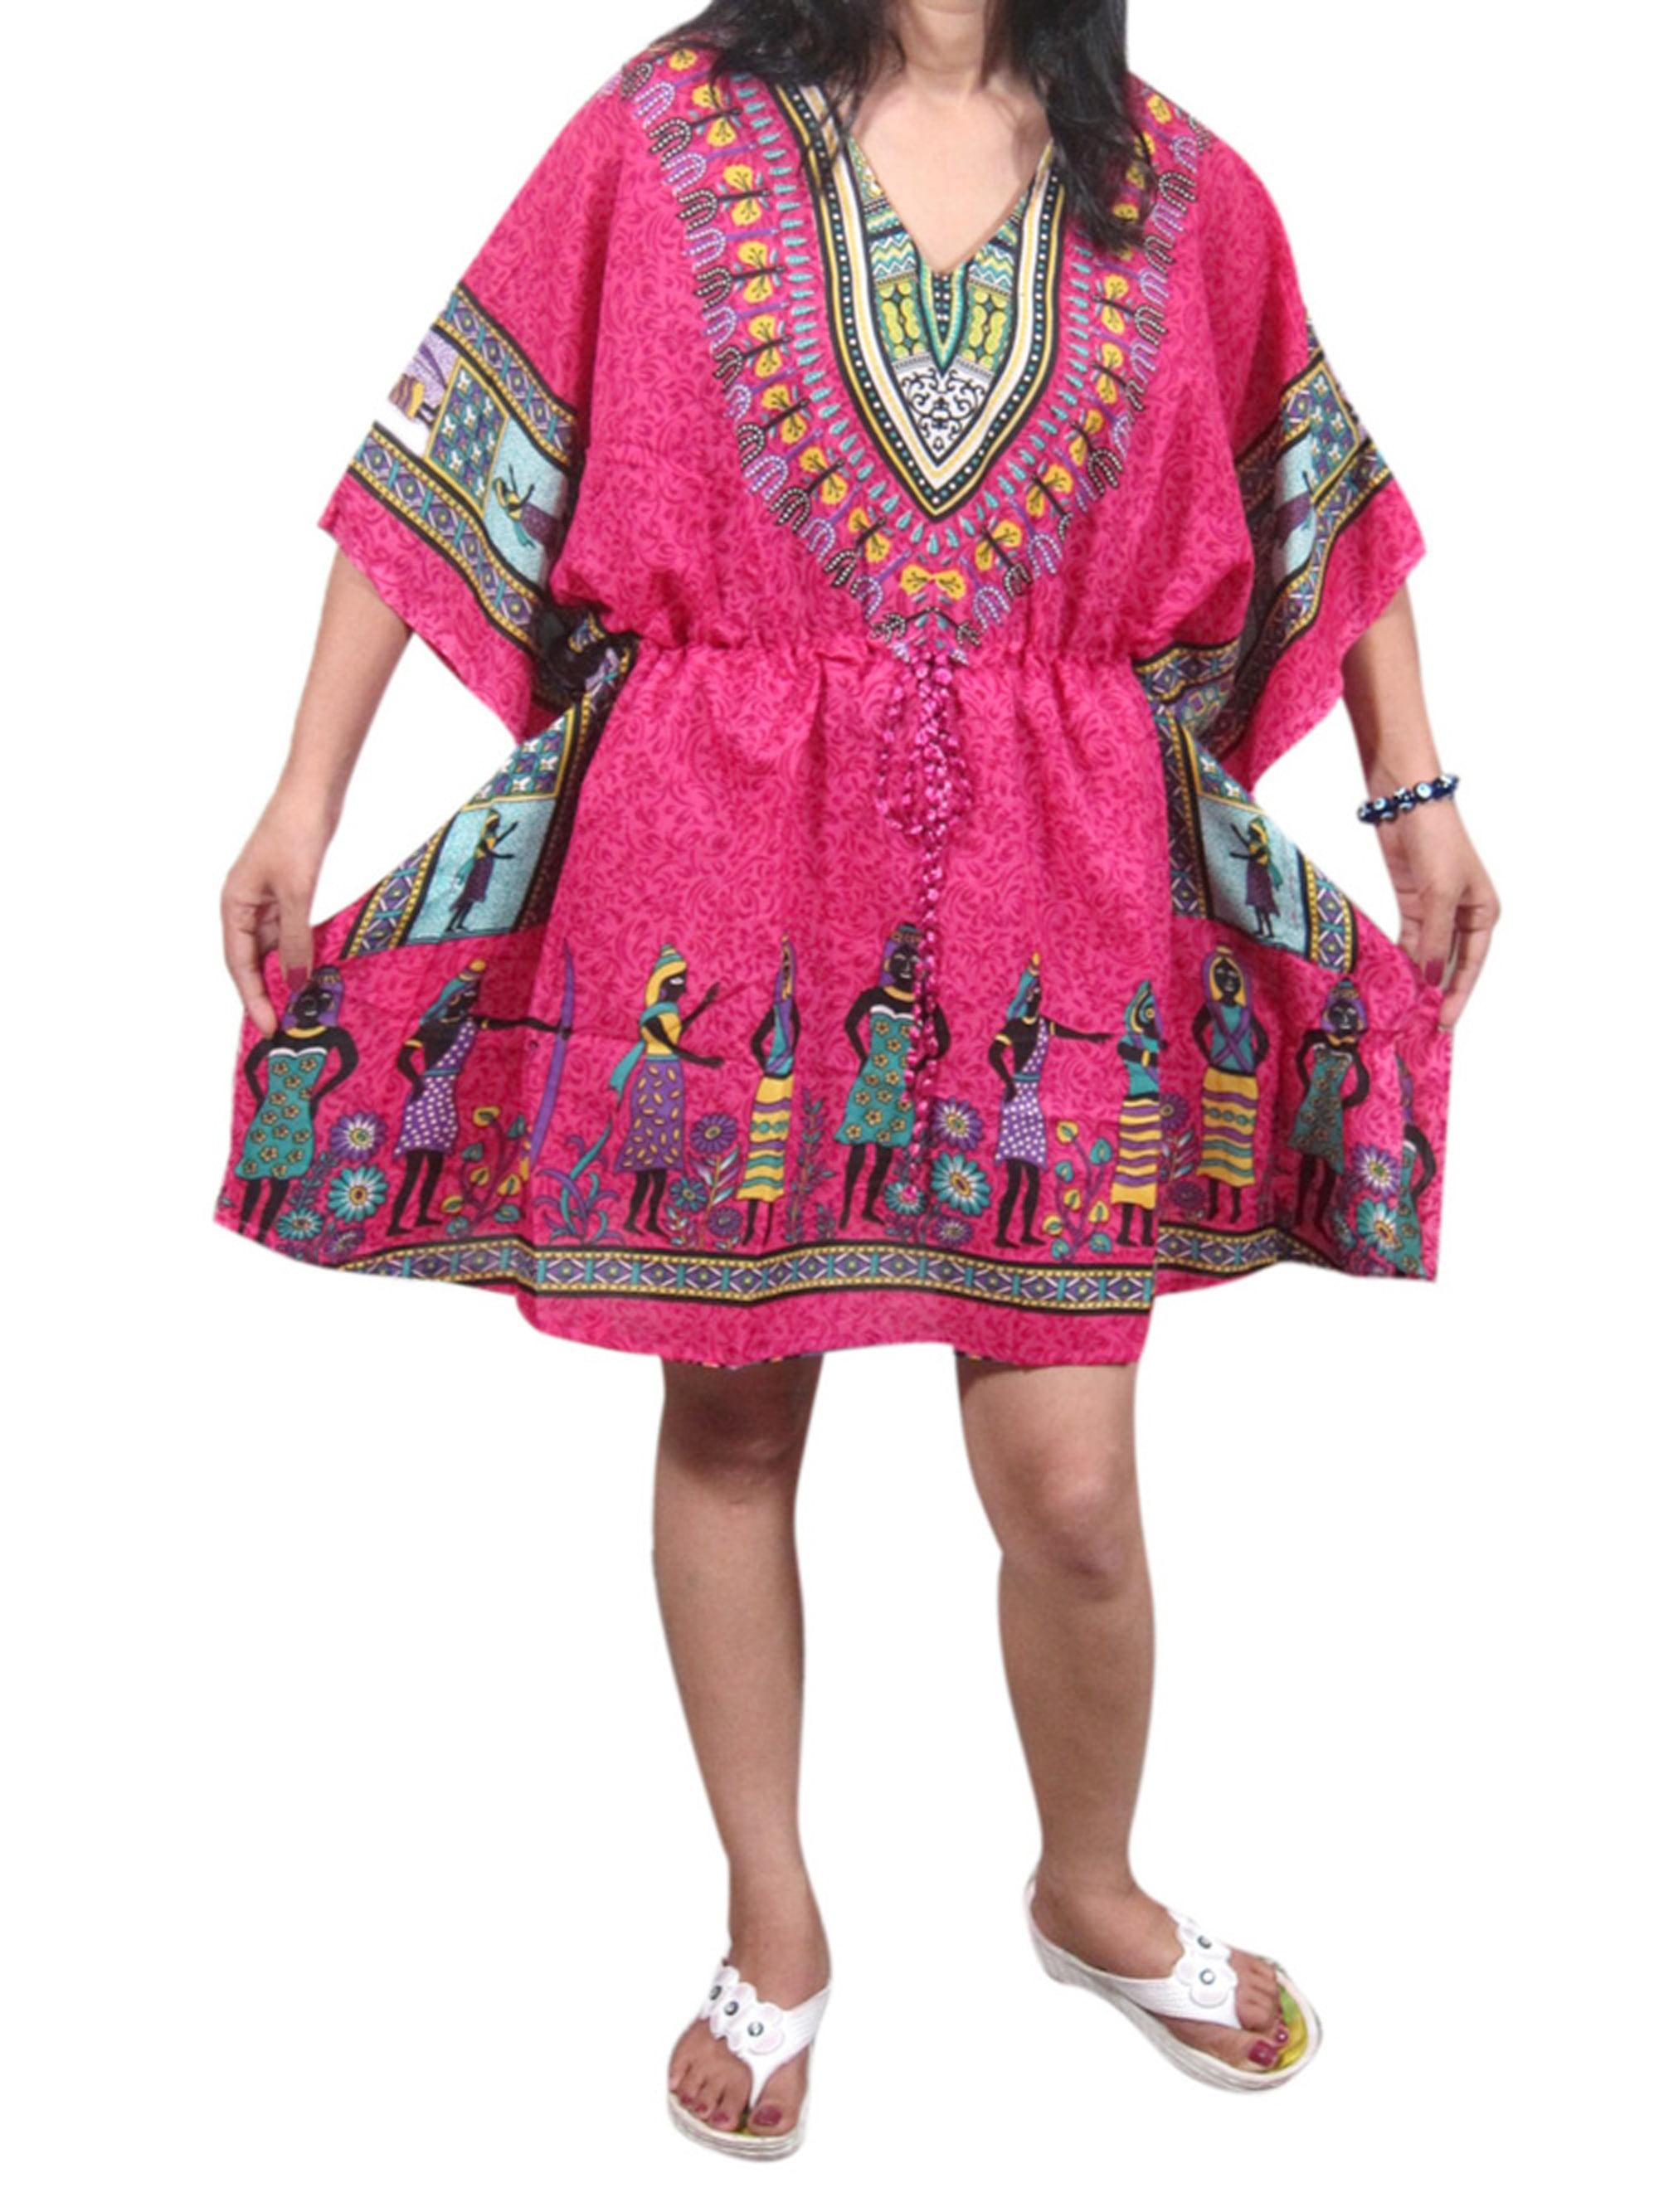 Mogul Women Kaftan Tops Pink Dashiki Beach Cover Up Tunic Caftan